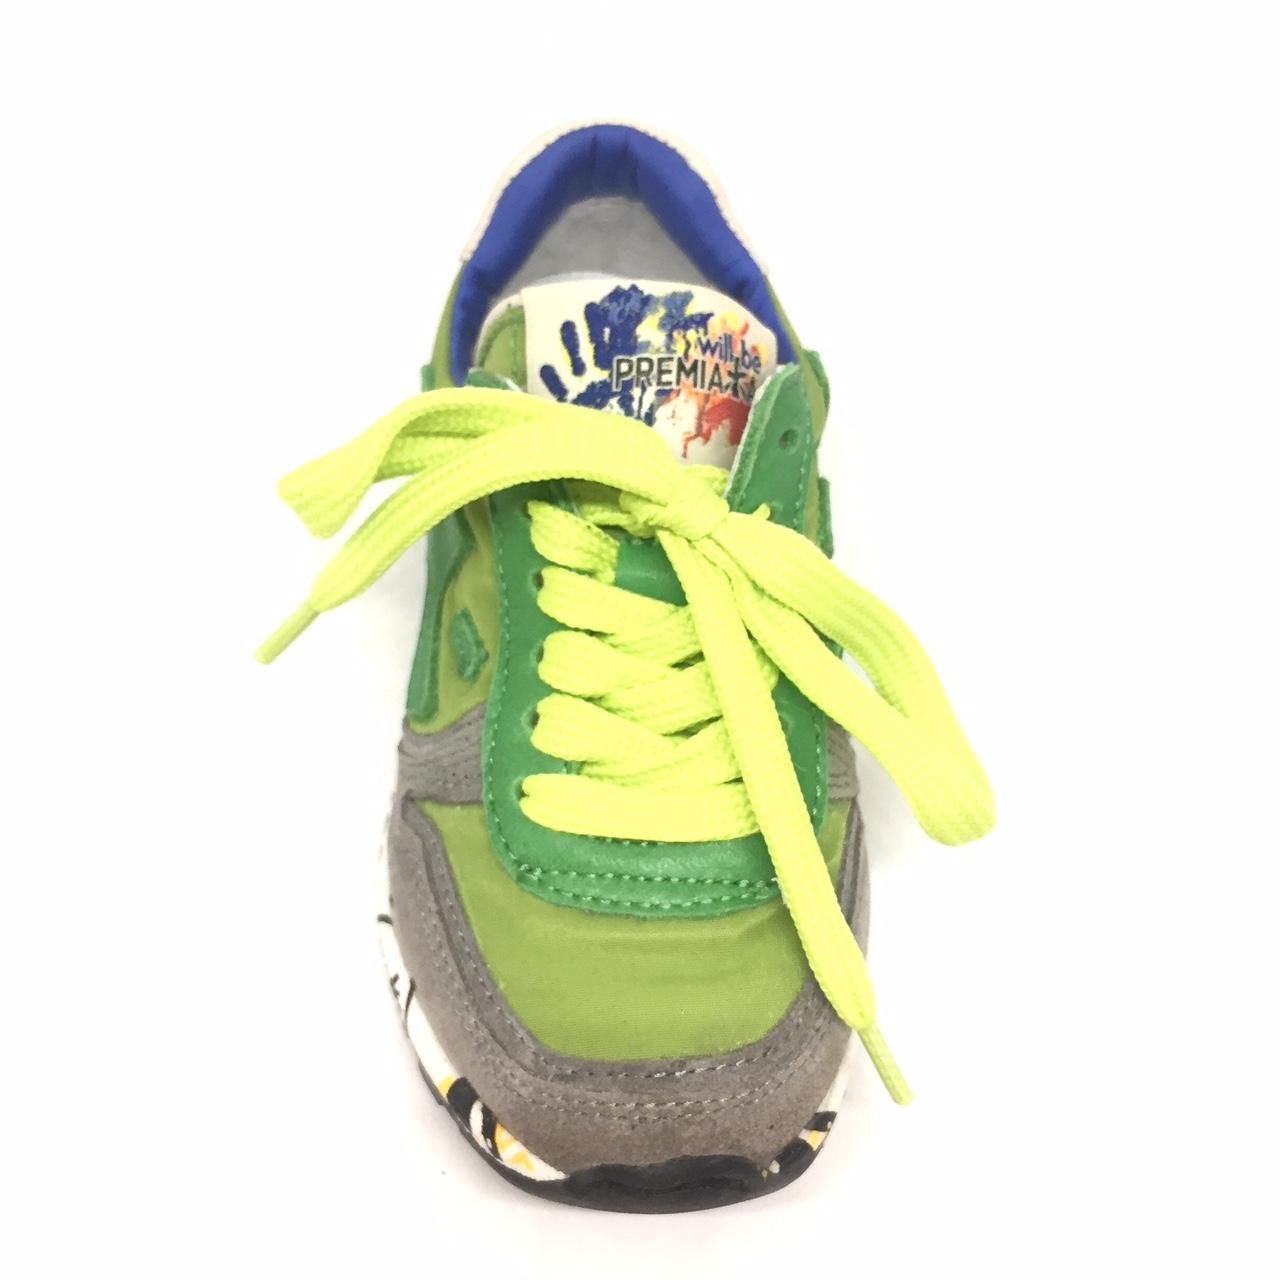 315e1af0afe5c Premiata Will be mod. Mick verde – La Griffe calzature